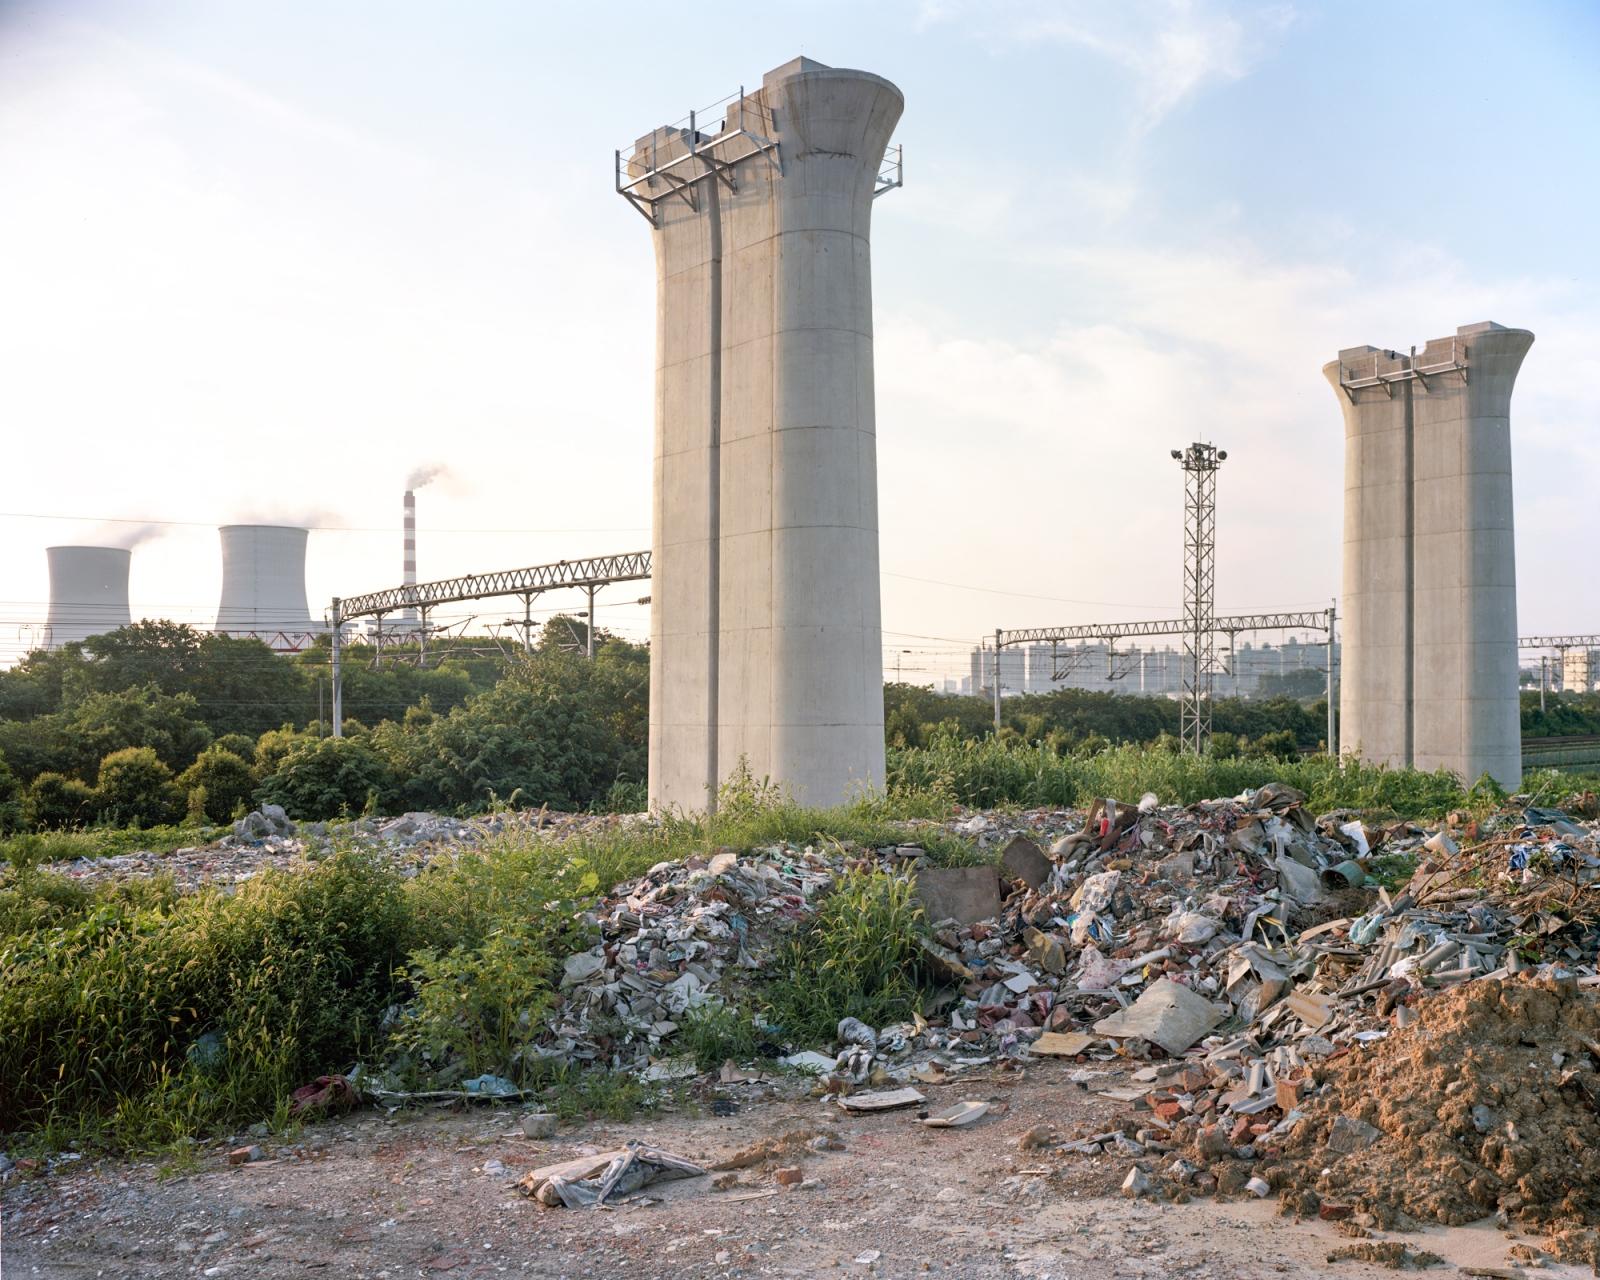 Hefai City, Anhui Province. 7/2013